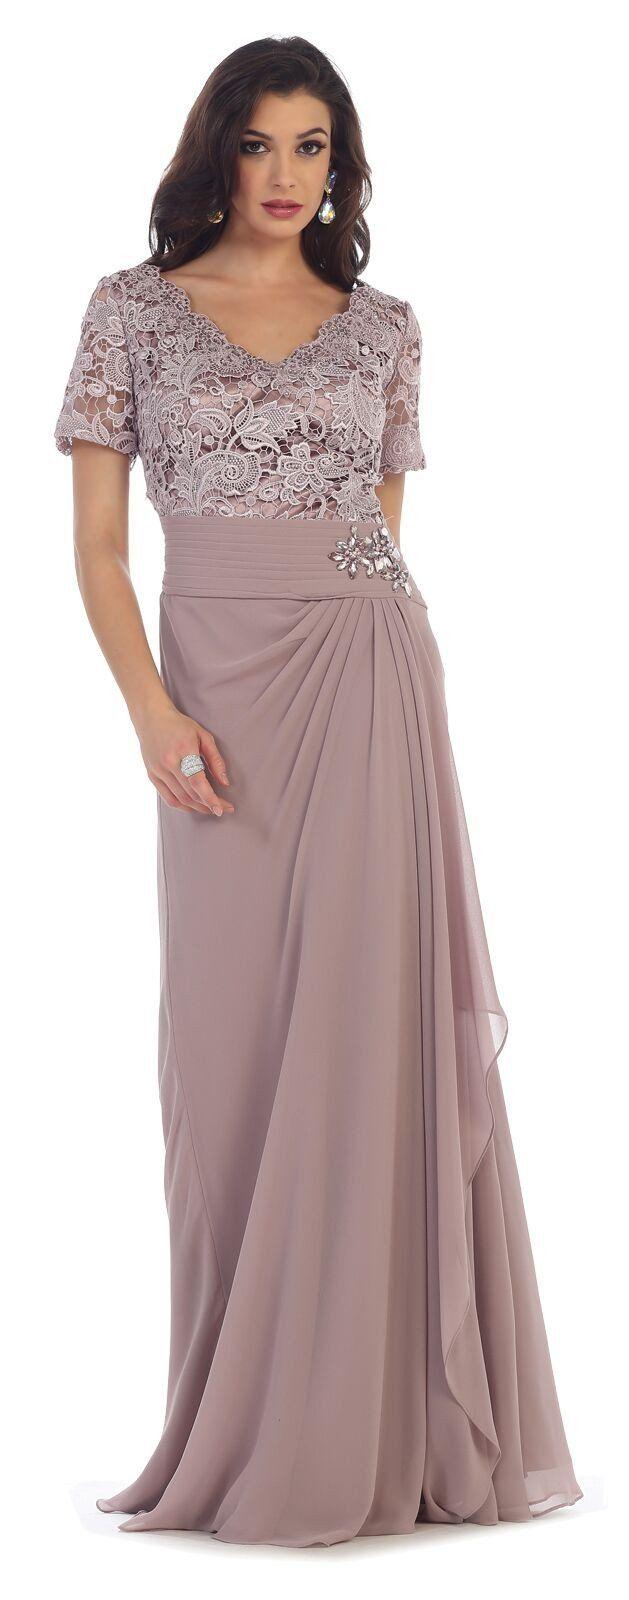 Silver wedding dresses plus size  Long Mother of the Bride Dress   MOB dress ideas  Pinterest